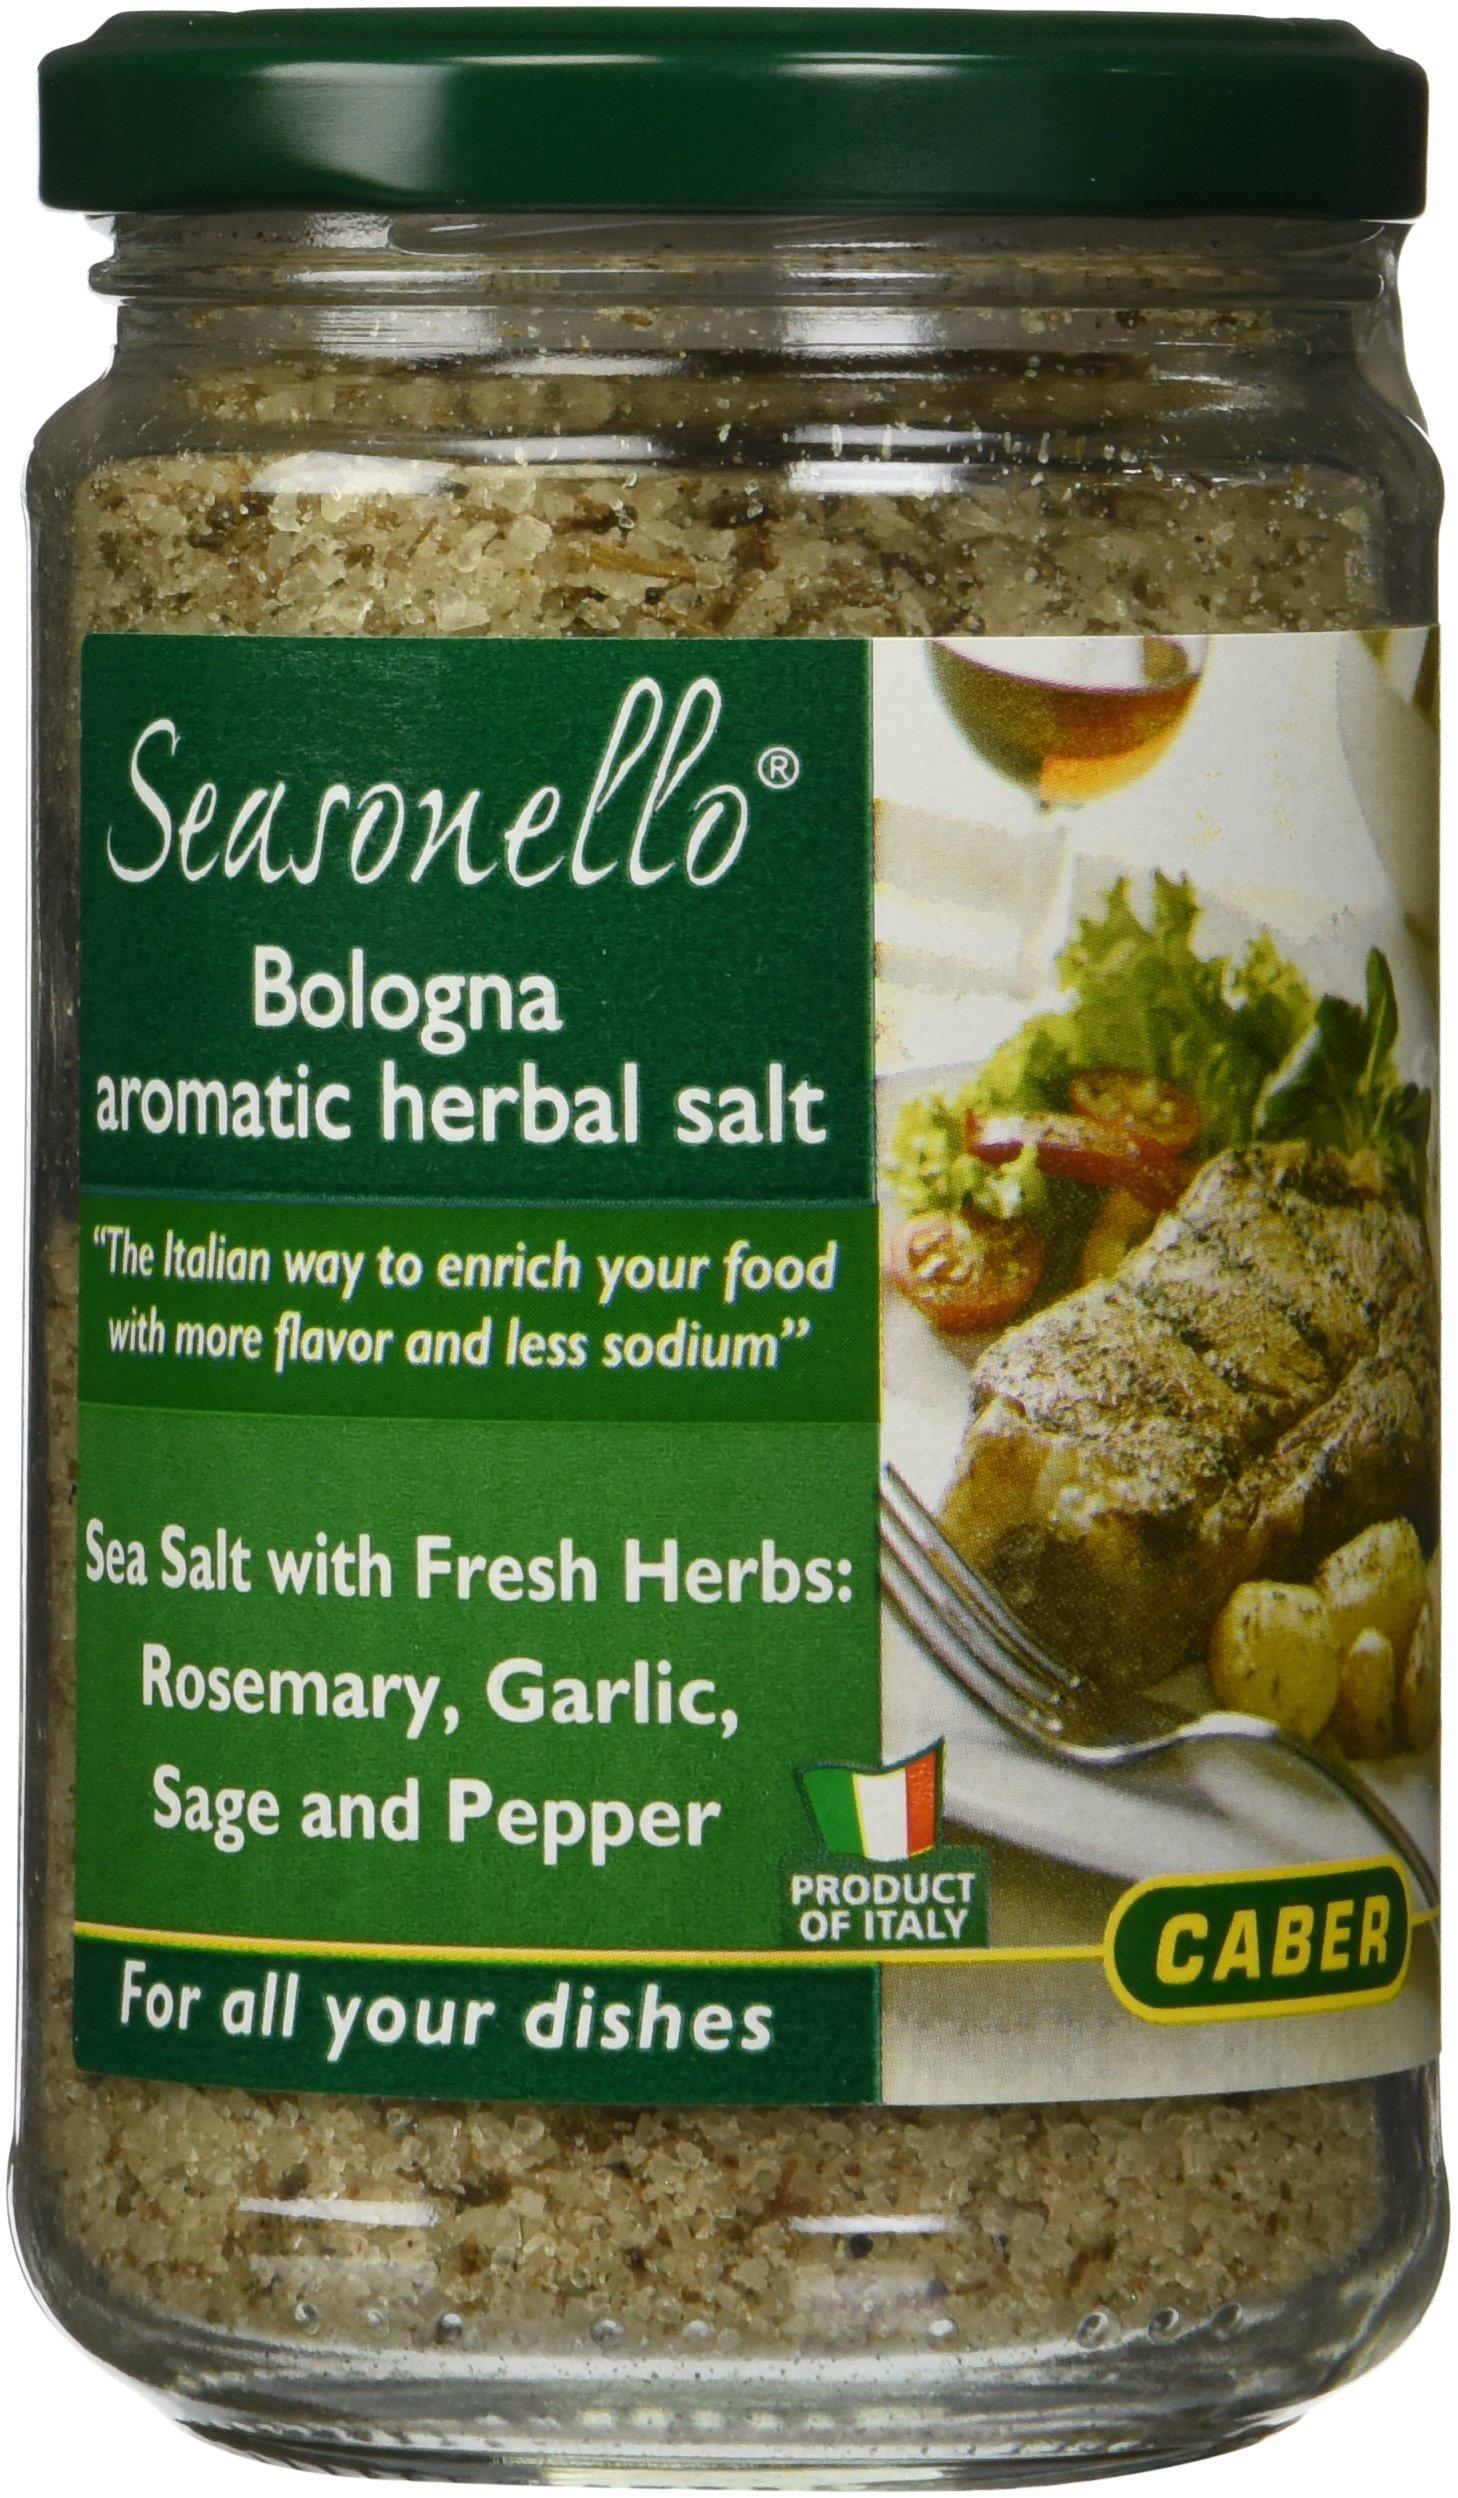 Seasonello Bologna Aromatic Herbal Salt 10.58 oz Each - 4 Jars by Seasonello (Image #1)